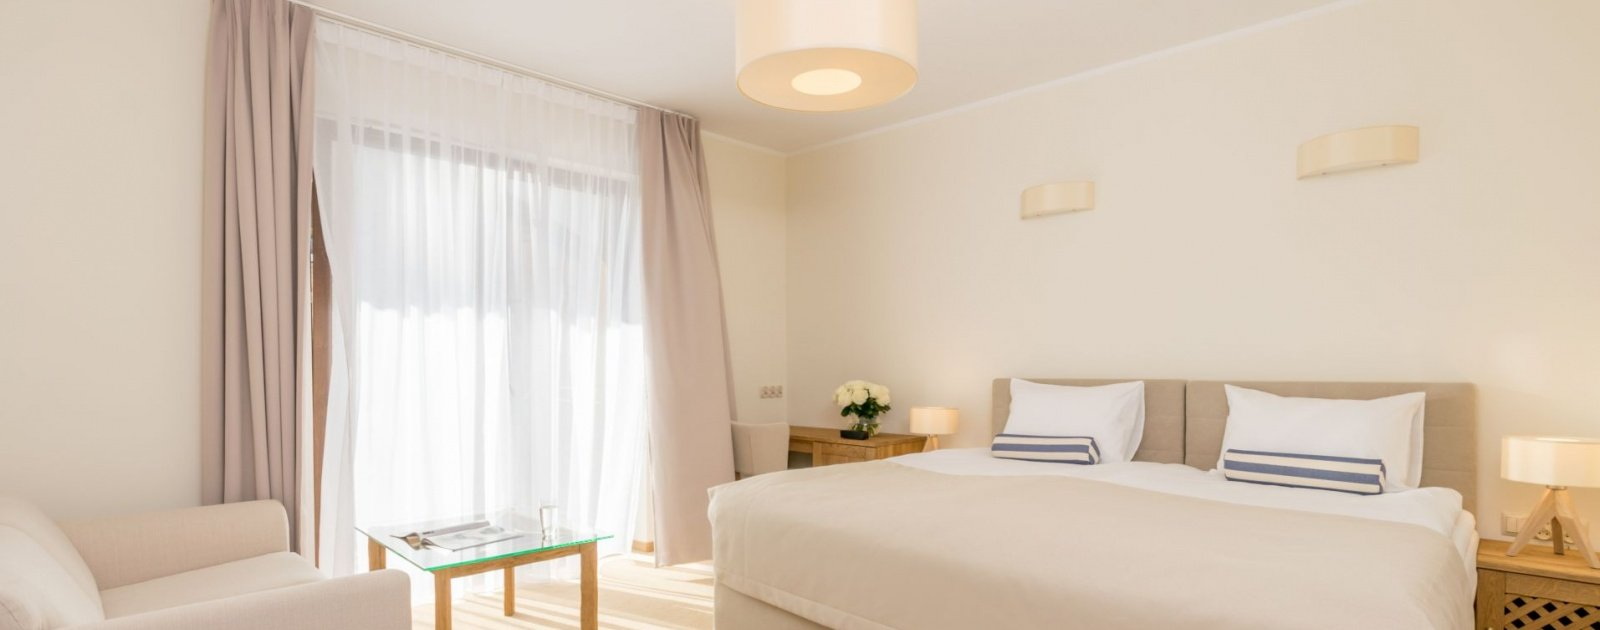 Hotel Szlak Bursztynowy